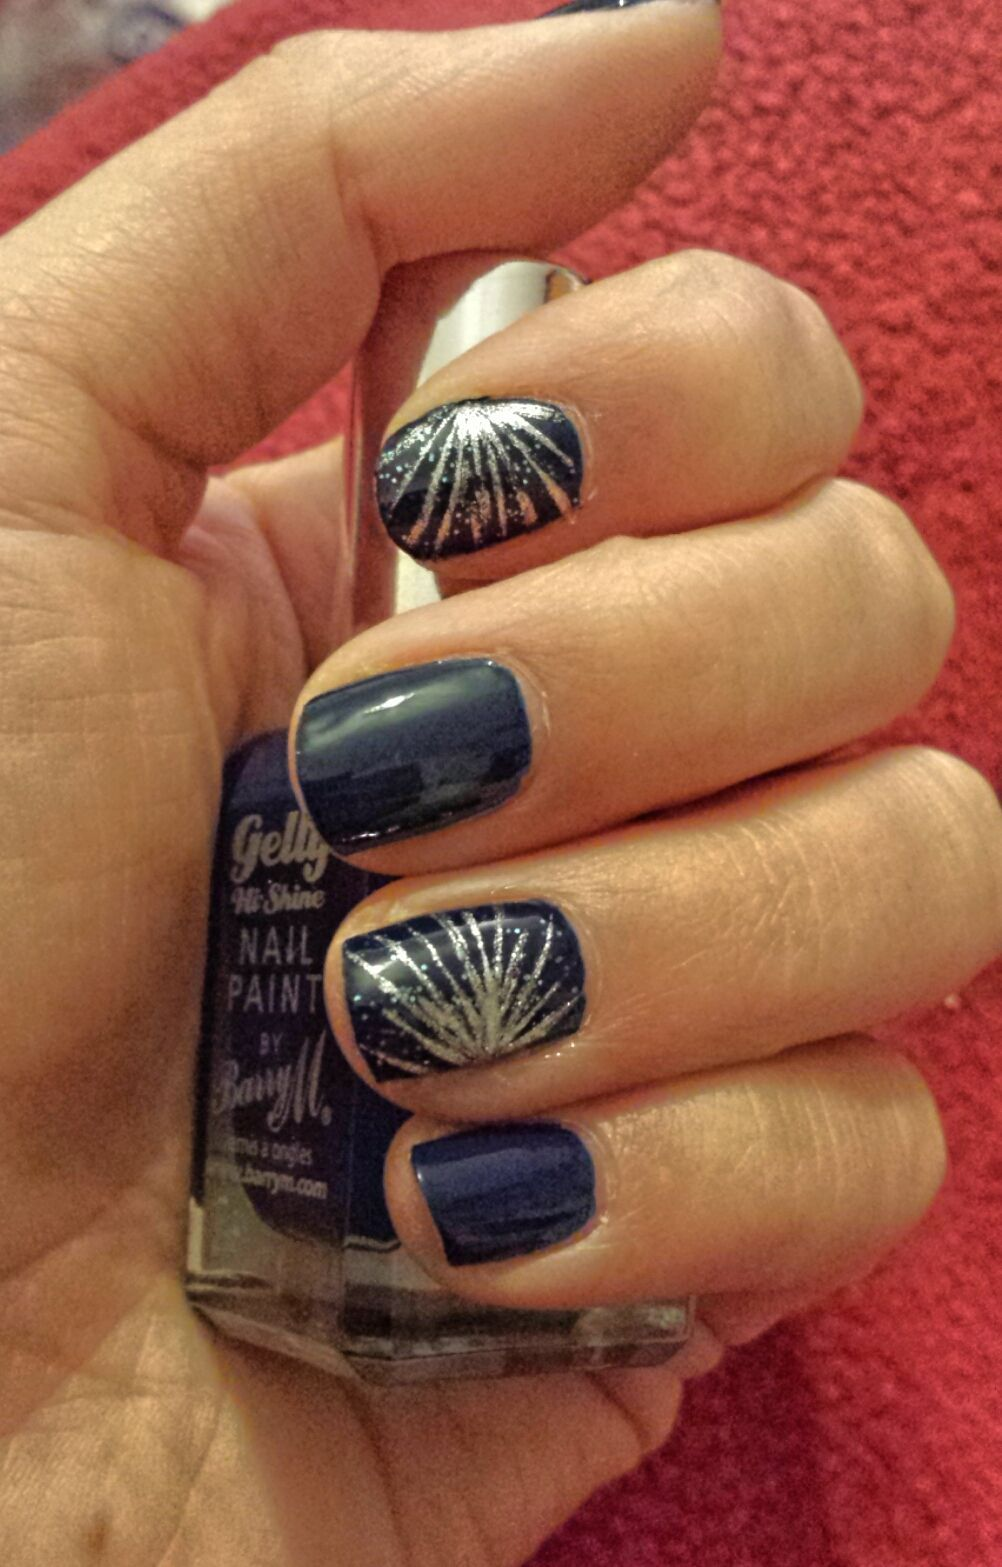 Nail design for new years eve nails nailart nye design